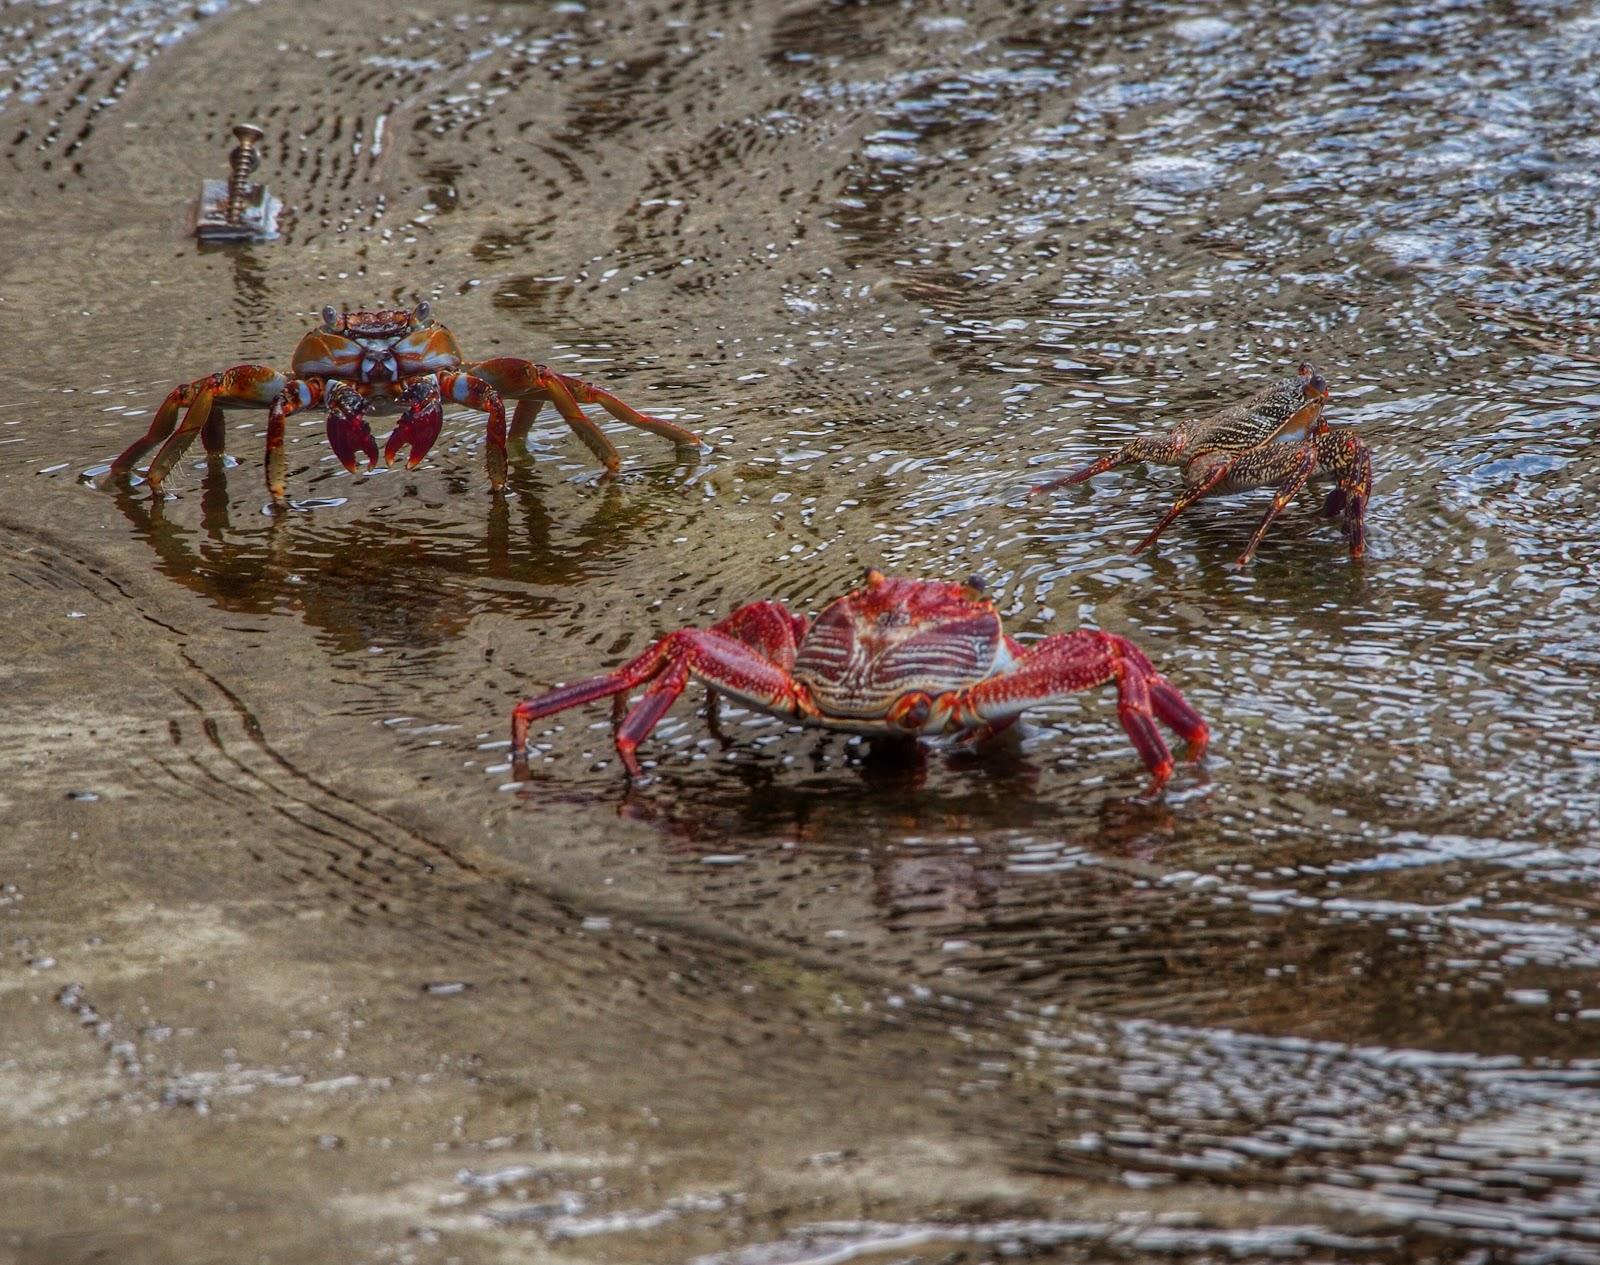 Curacao Crabs, #crabs #curacao #willemstad 2014